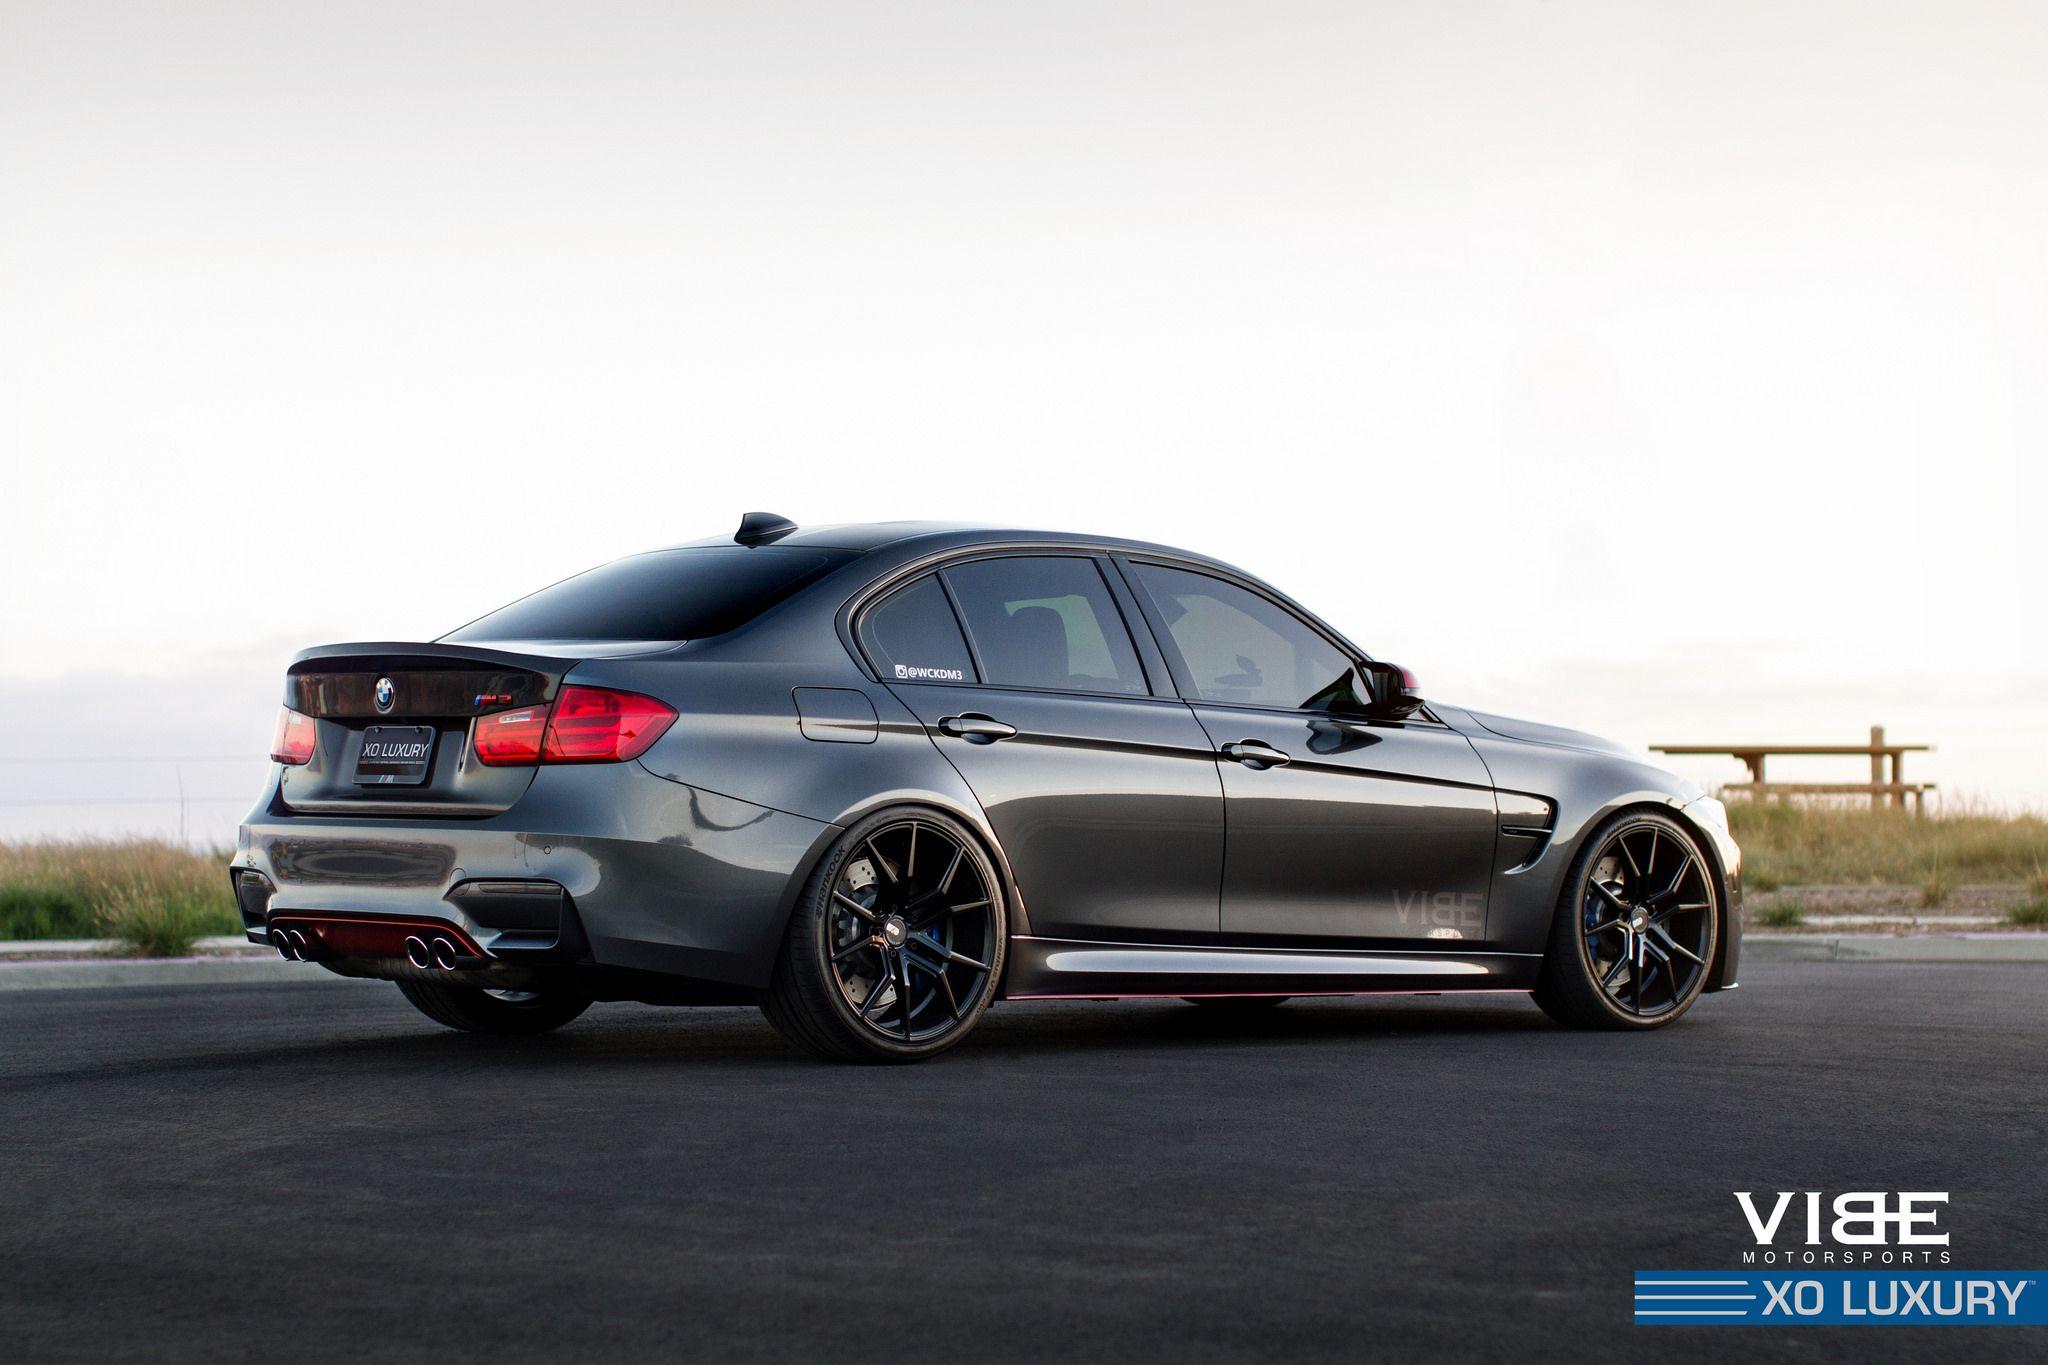 #BMW #F80 #M3 #Sedan #MineralGrey #Provocative #Eyes #Sexy #Hot #Live #Life #Love #Follow #Your #Heart #BMWLife